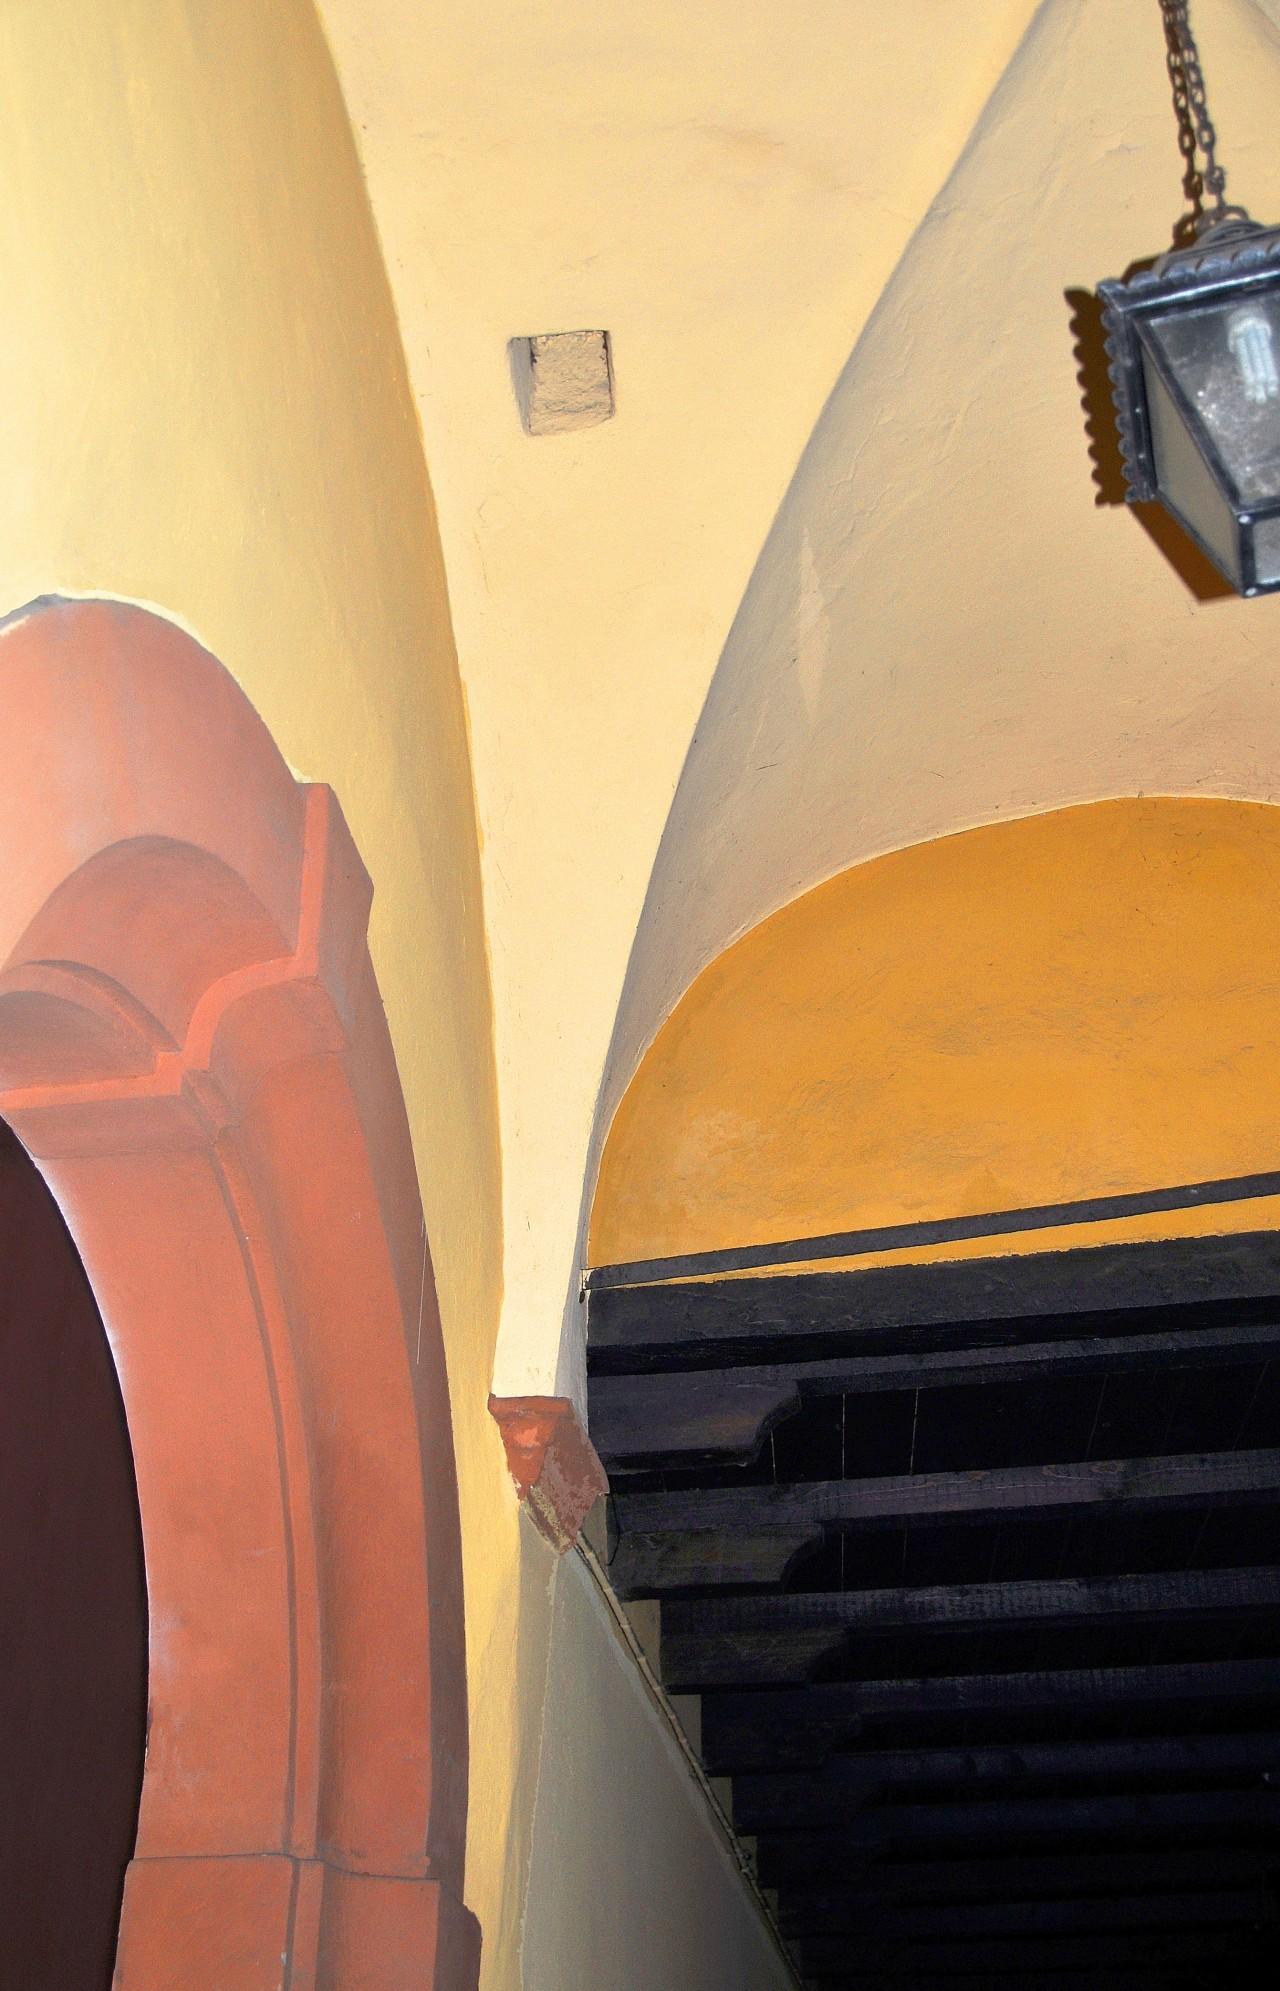 Spioncino-Via Valdonica 14